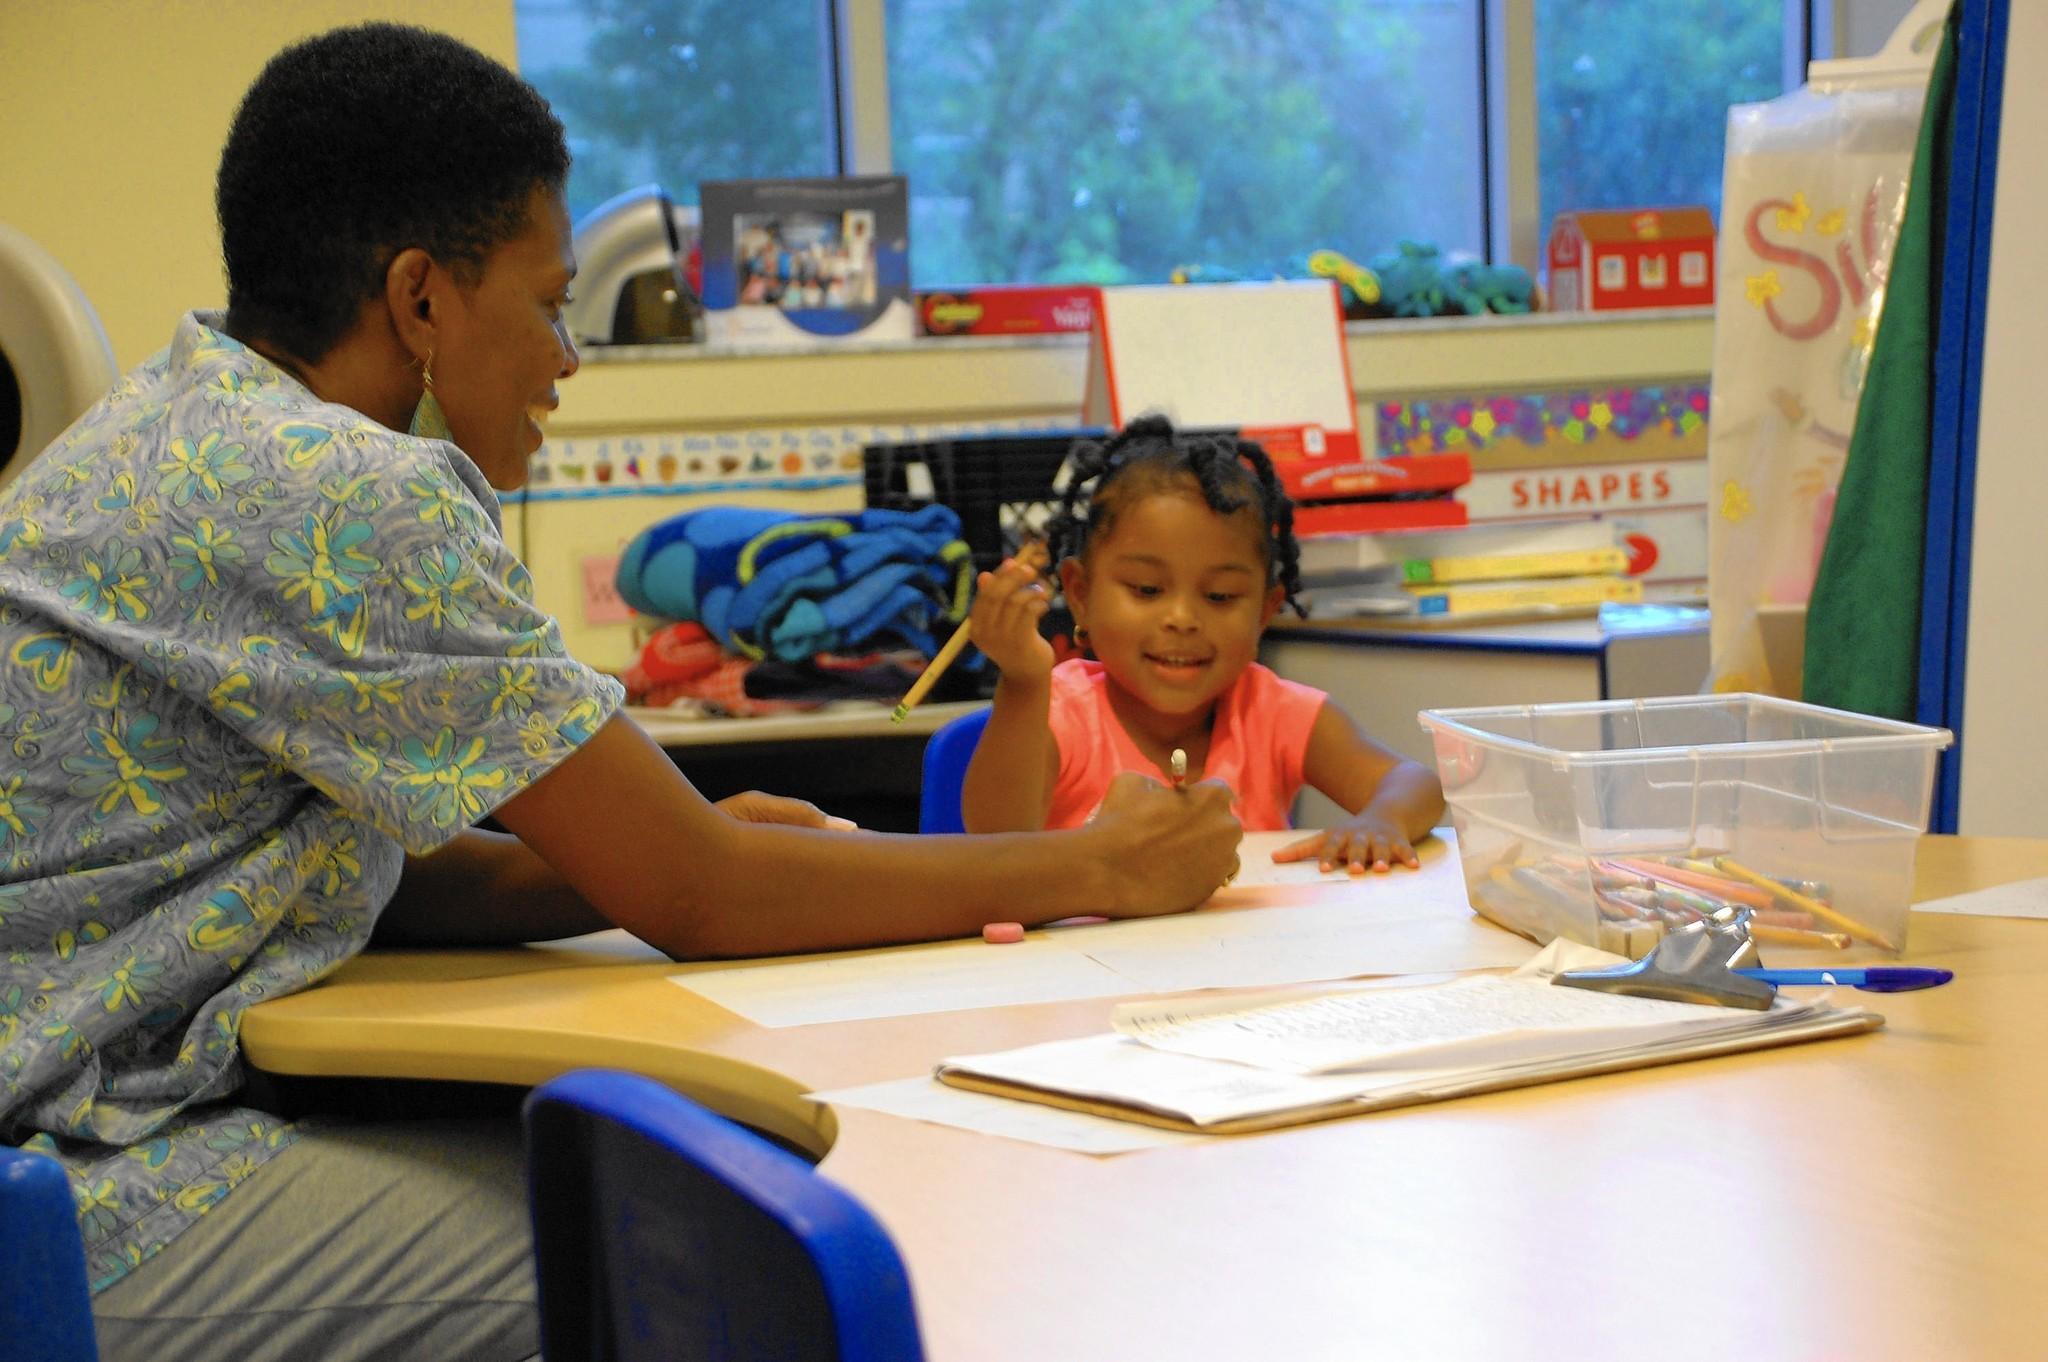 Dough For Child Care Can Help Families Off Dole Darryl E Owens Orlando Sentinel